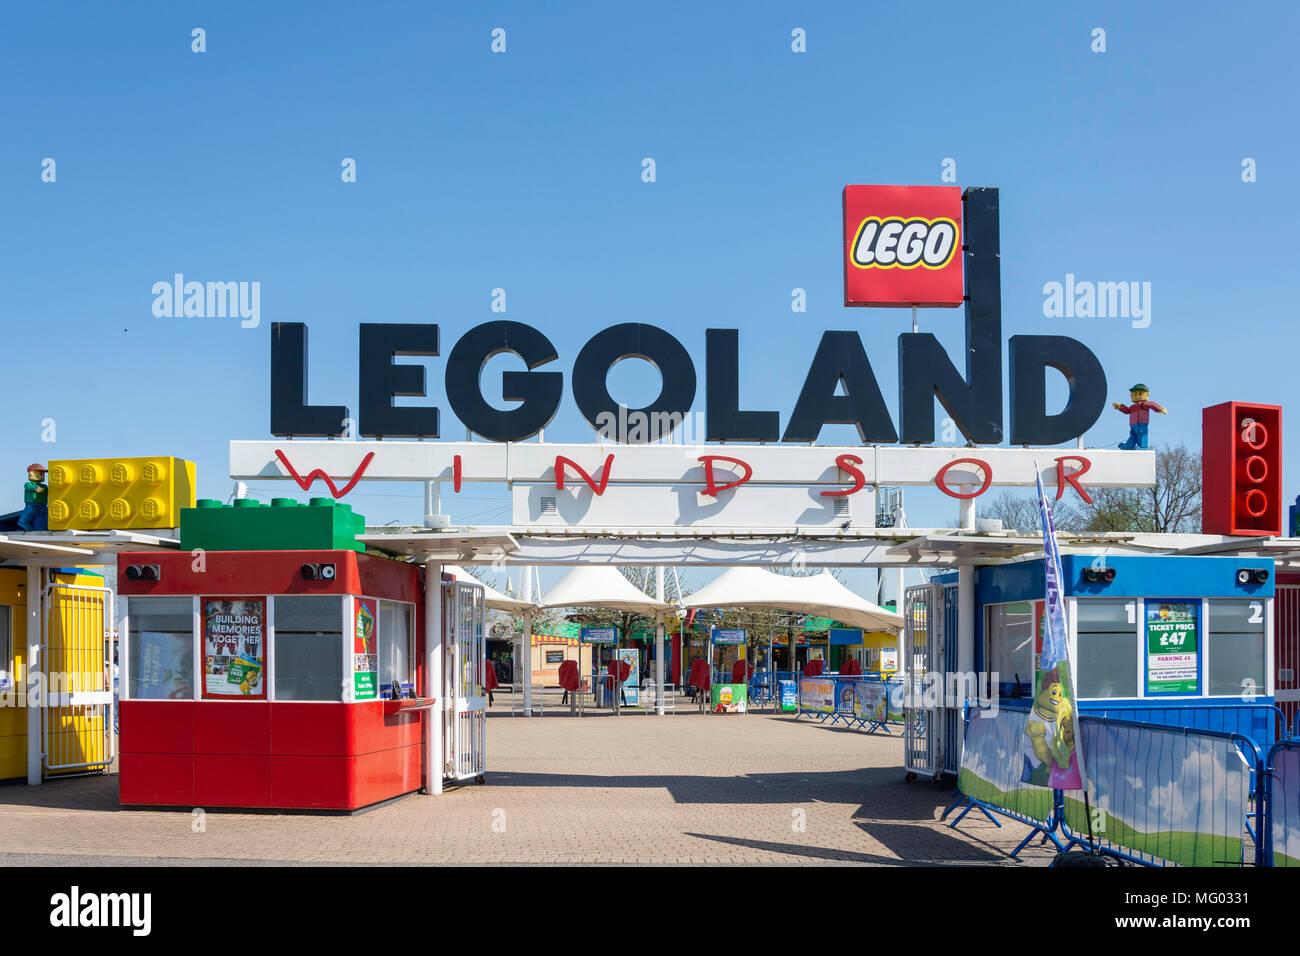 Entrance gate to Legoland Windsor Resort, Windsor, Berkshire, England, United Kingdom Stock Photo